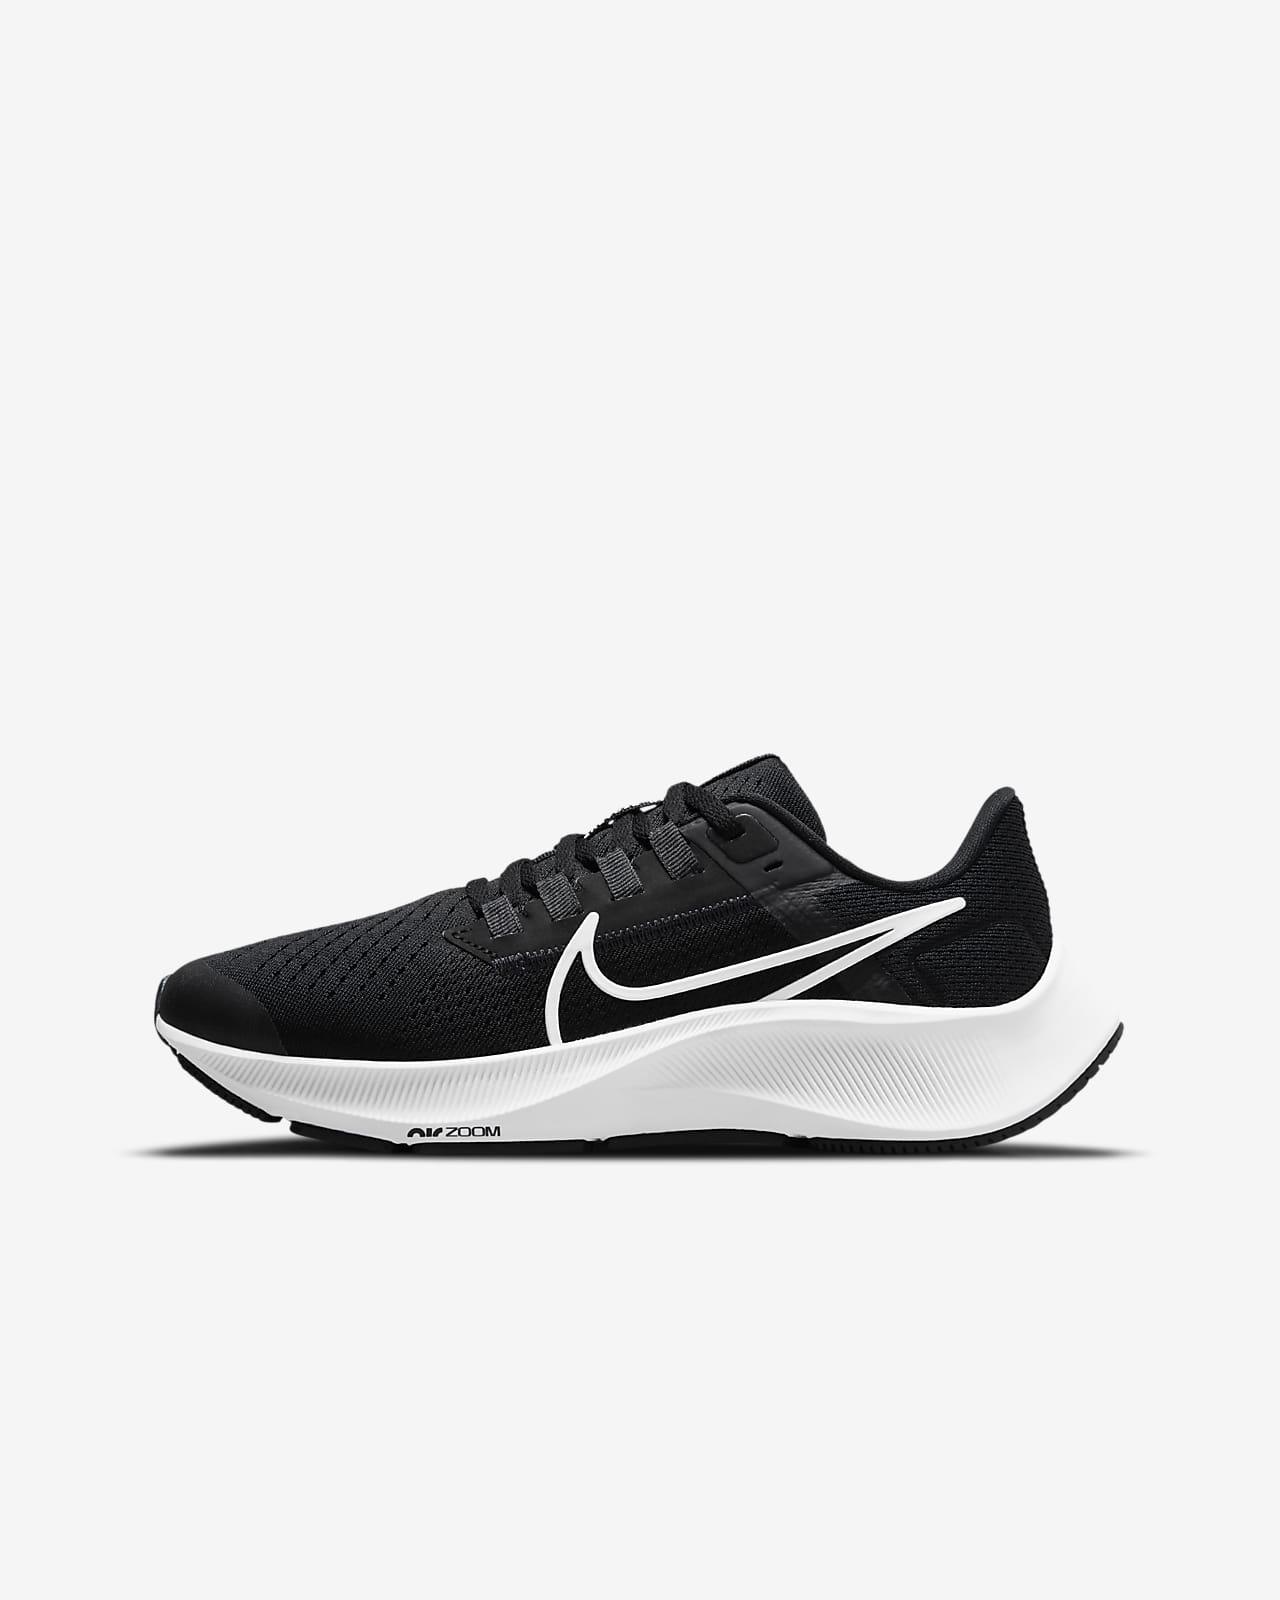 Scarpa da running Nike Air Zoom Pegasus 38 - Bambini/Ragazzi